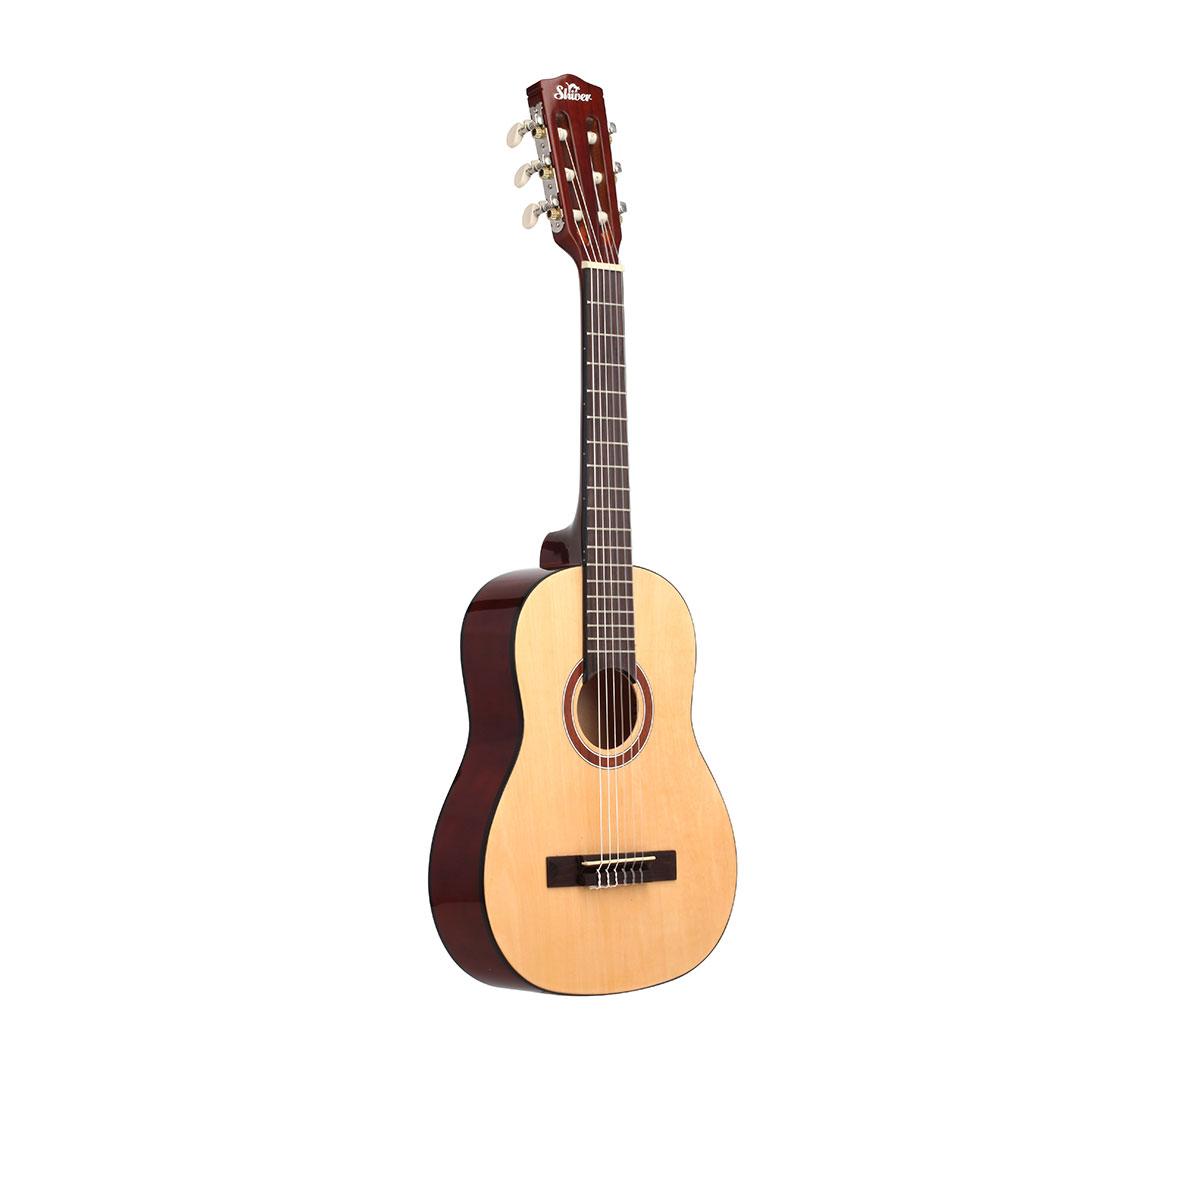 Shiver - GCS-1/4 guitare classique Naturelle